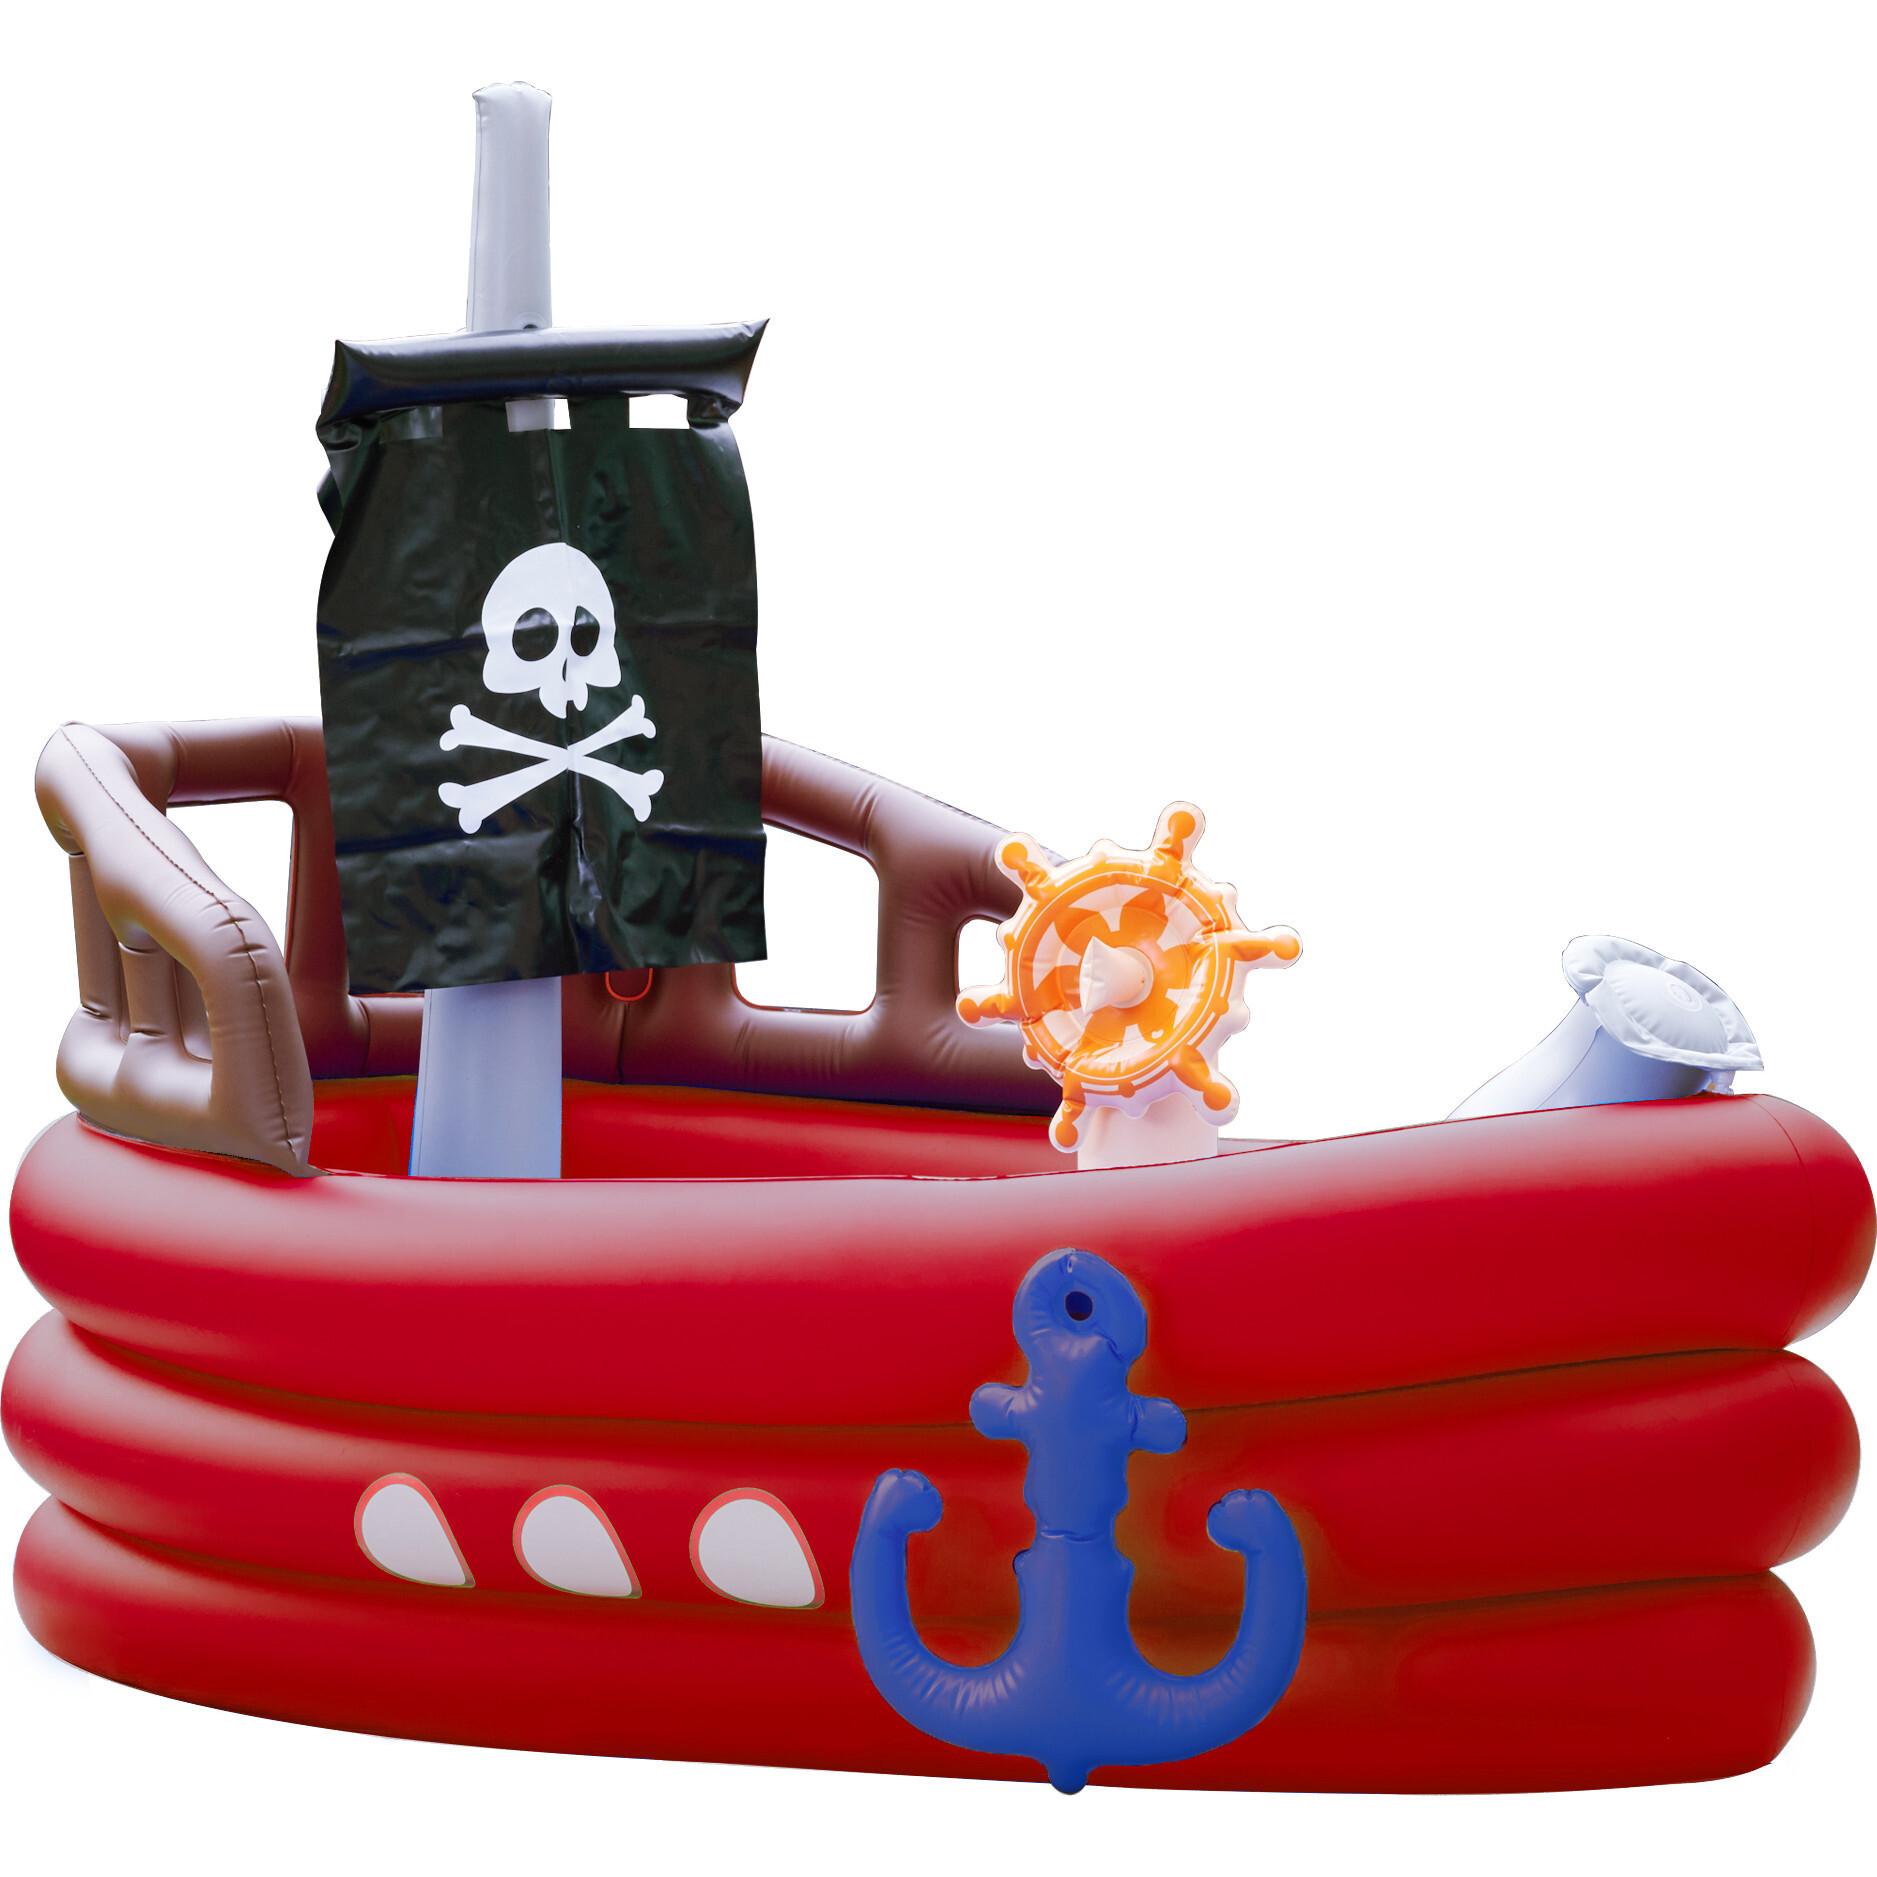 Teamson Kids Inflatable Pirate Boat Sprinkler